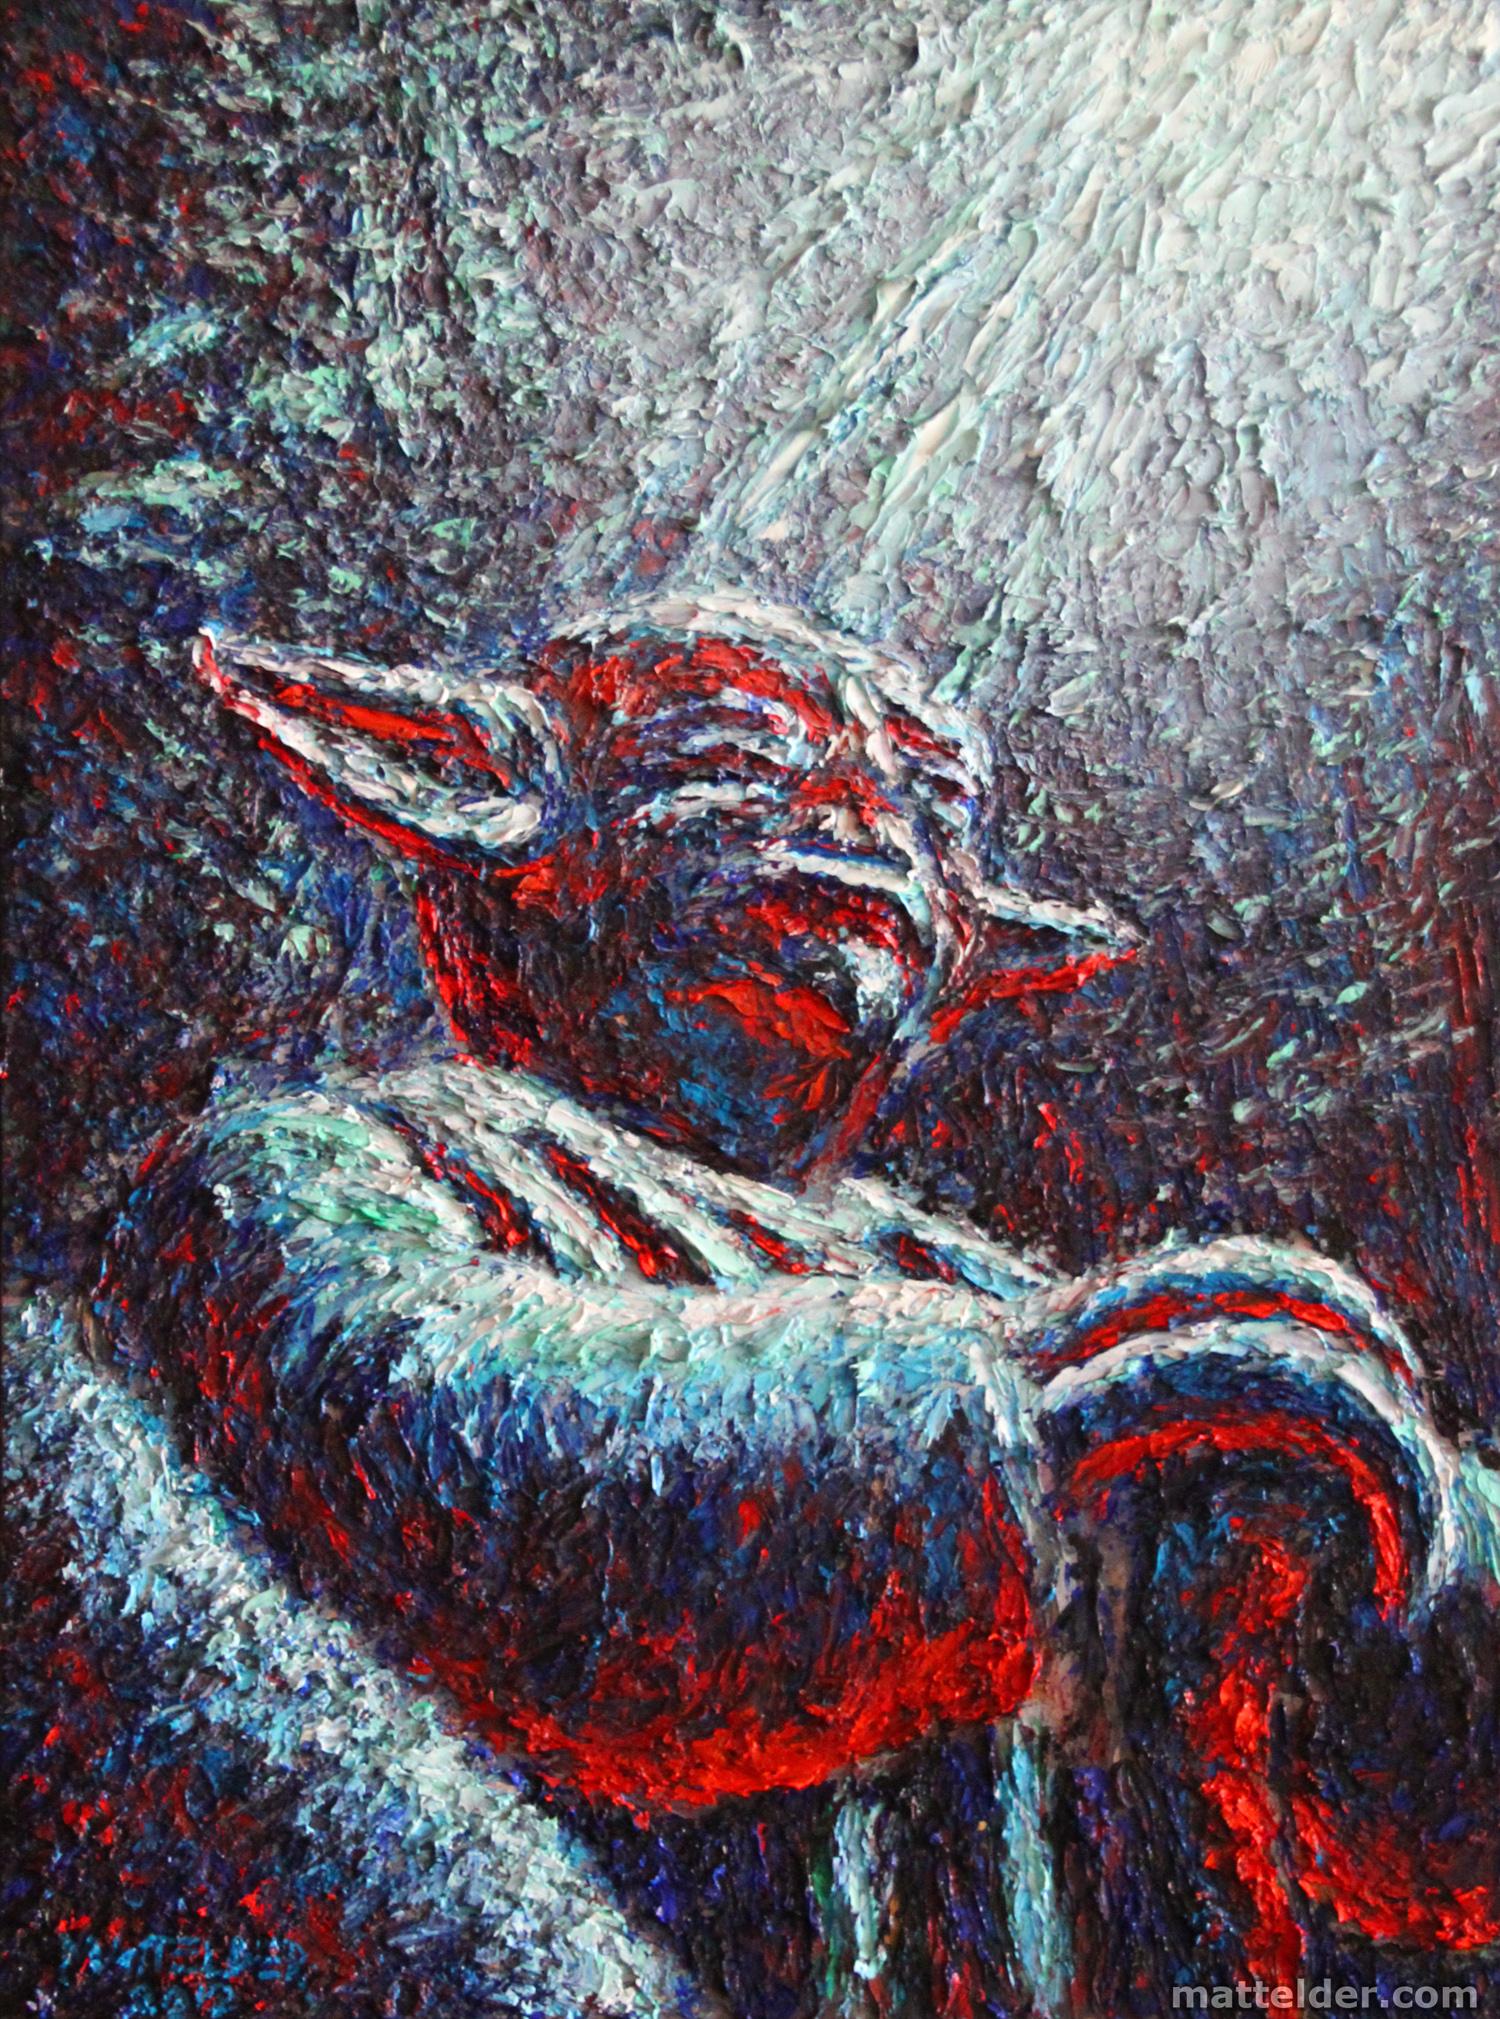 Yoda on Dagobah - Oil Painting